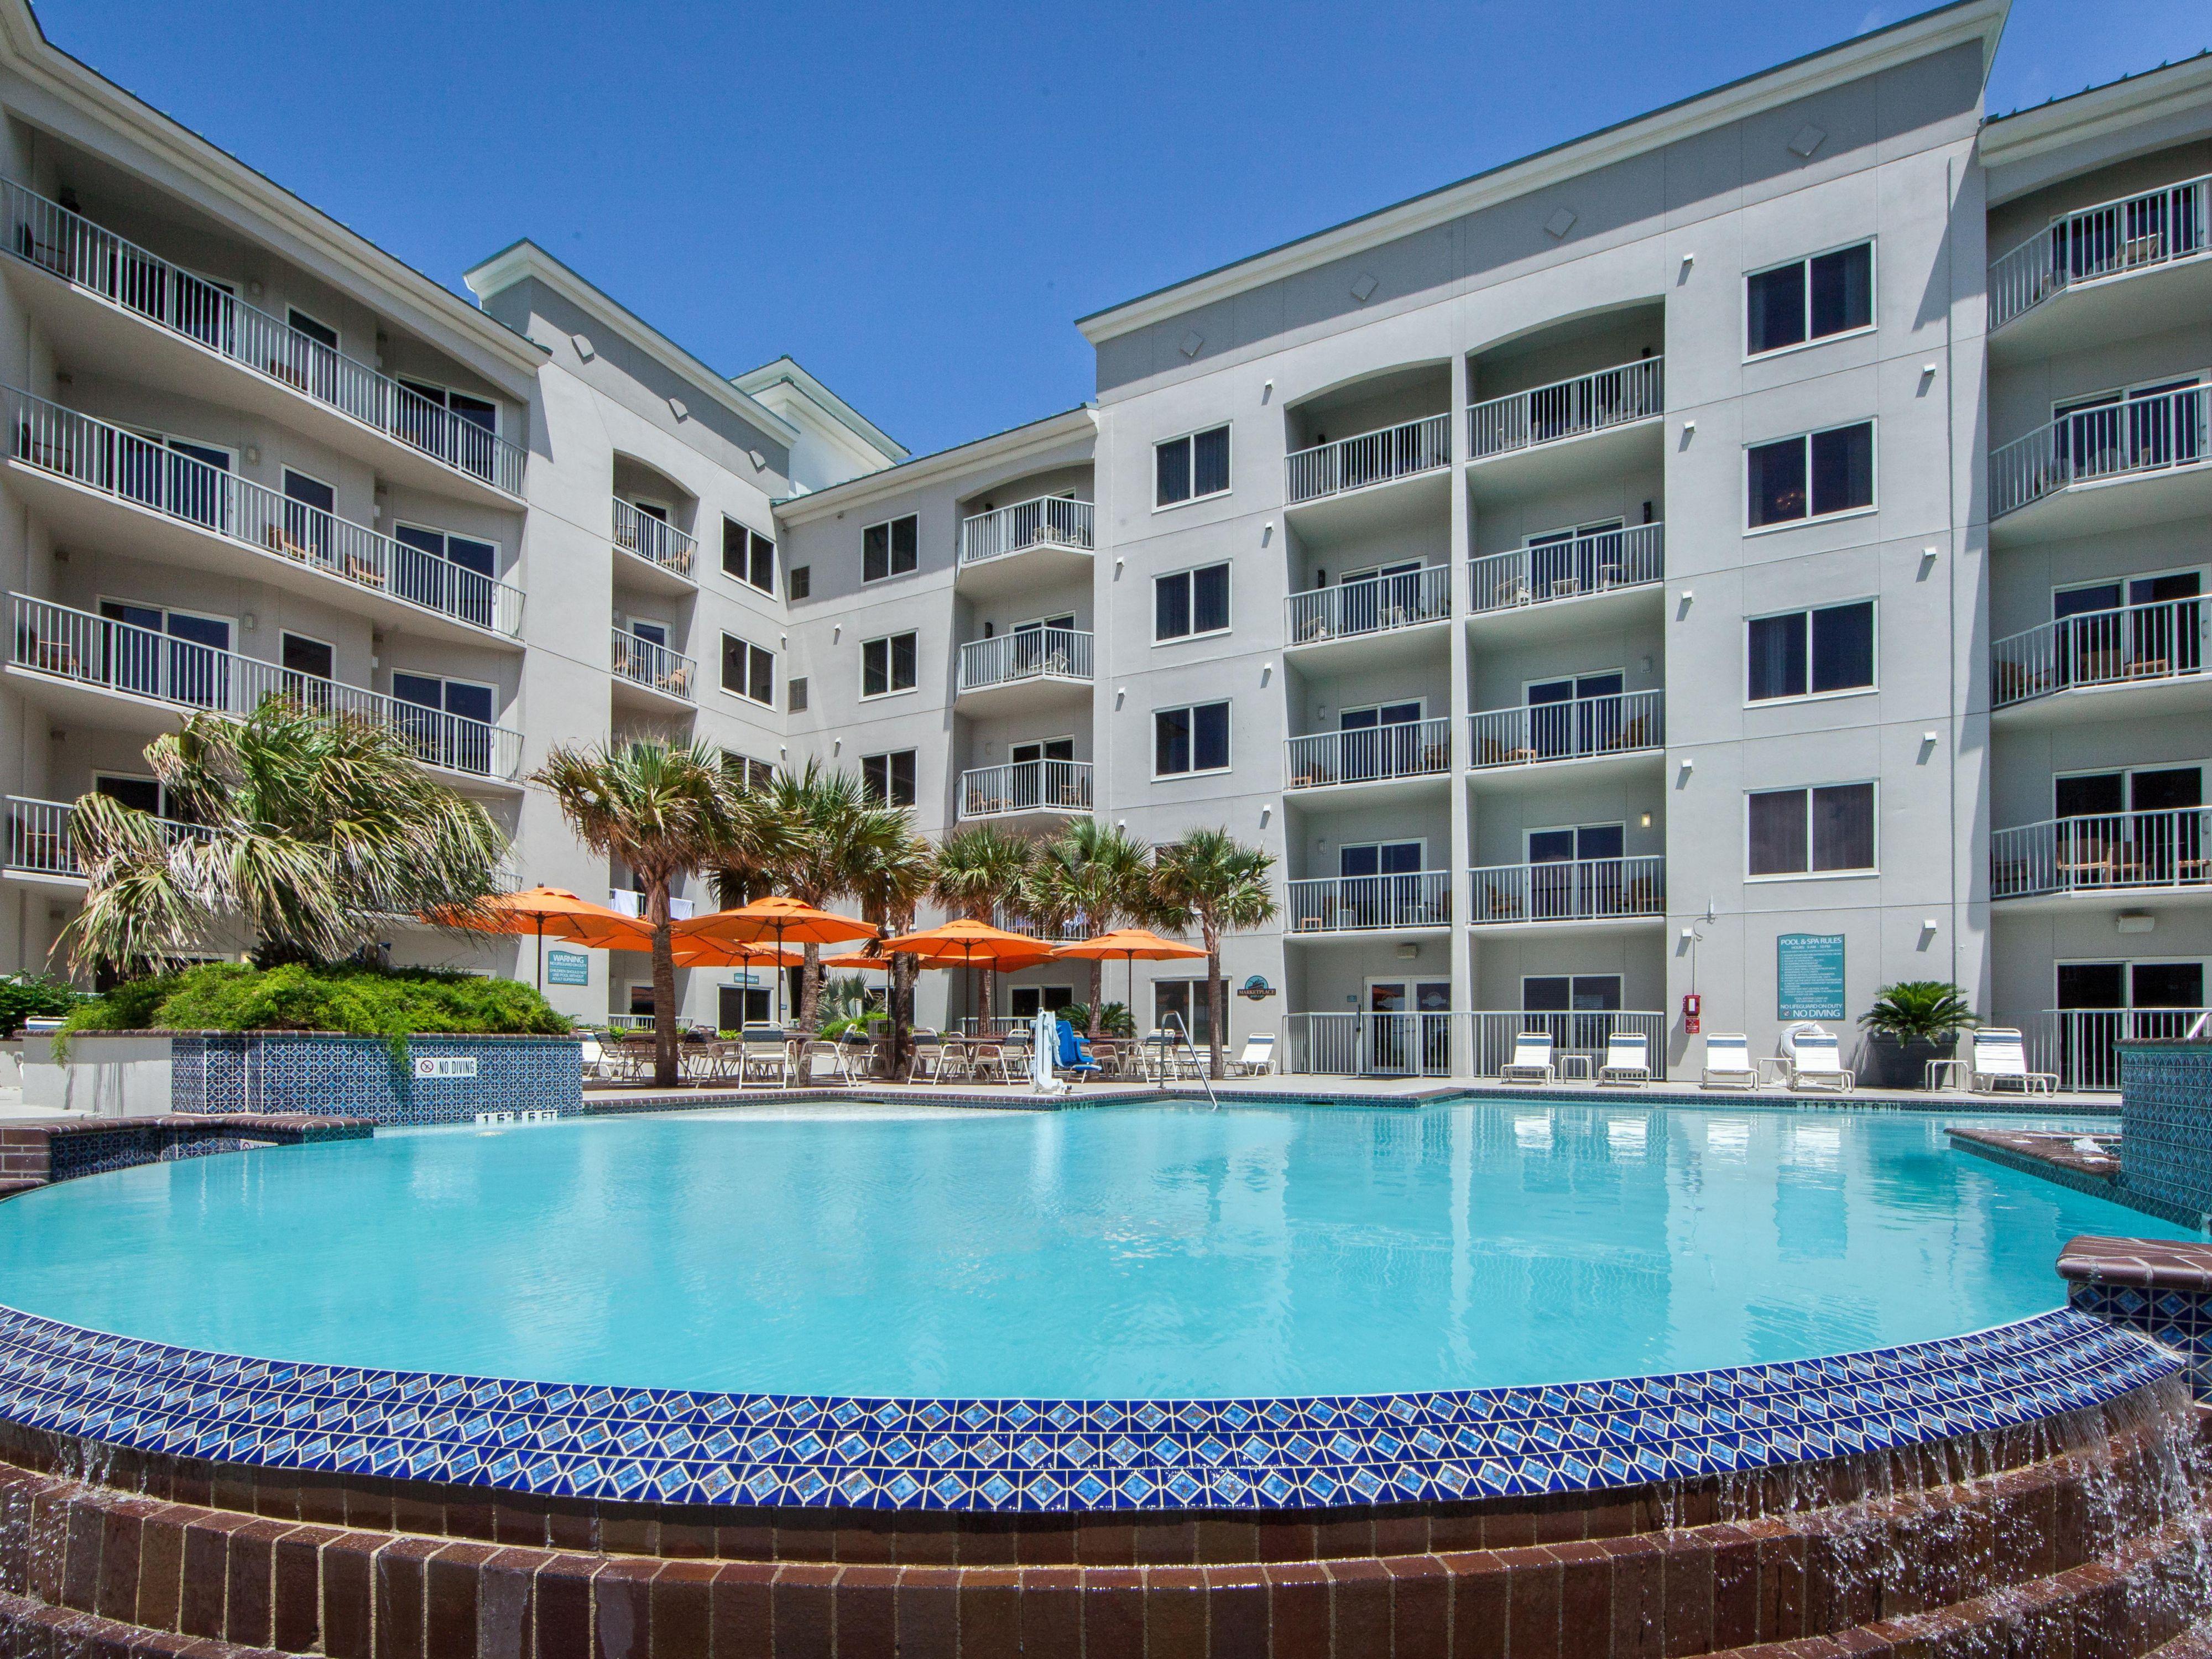 Holiday Inn Club Vacations Galveston Beach Resort Hotel by IHG